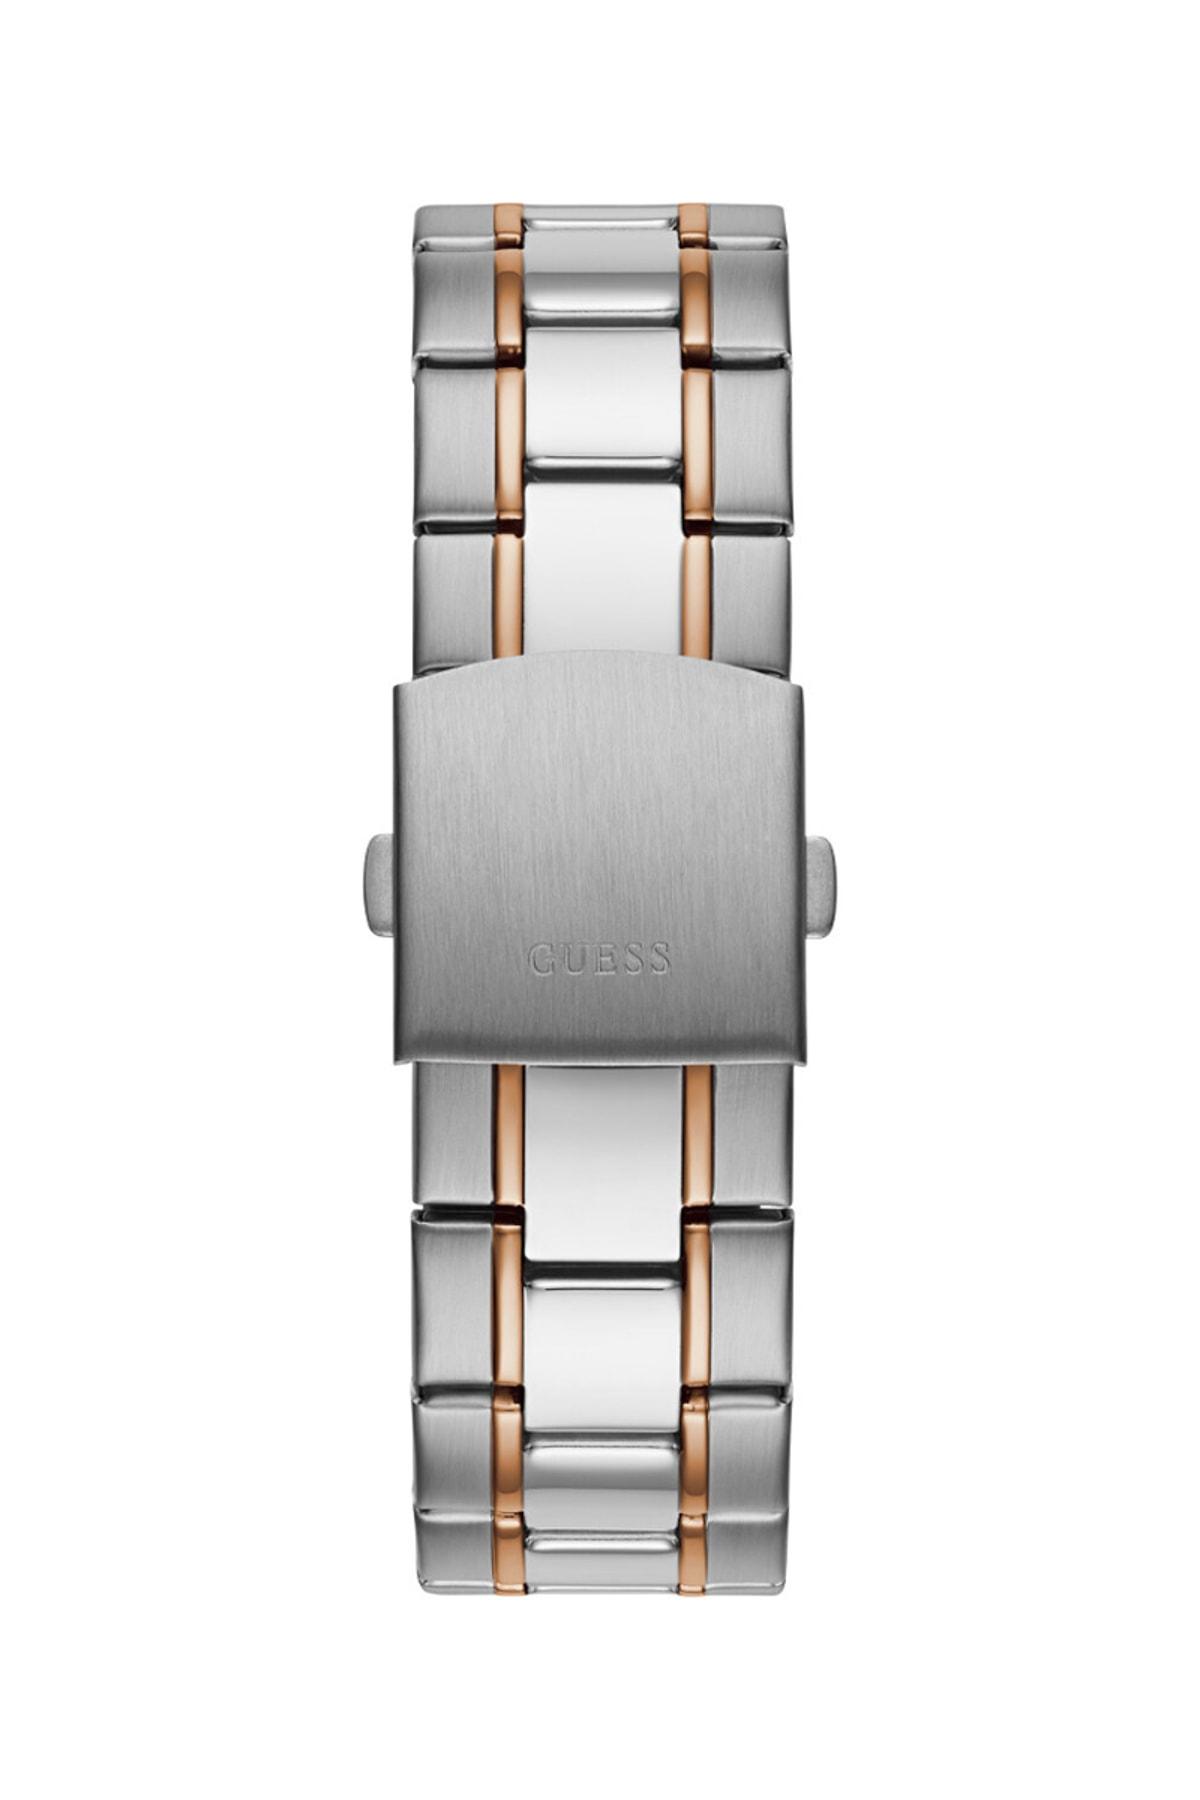 سفارش ساعت مردانه برند Guess رنگ بژ کد ty39028627